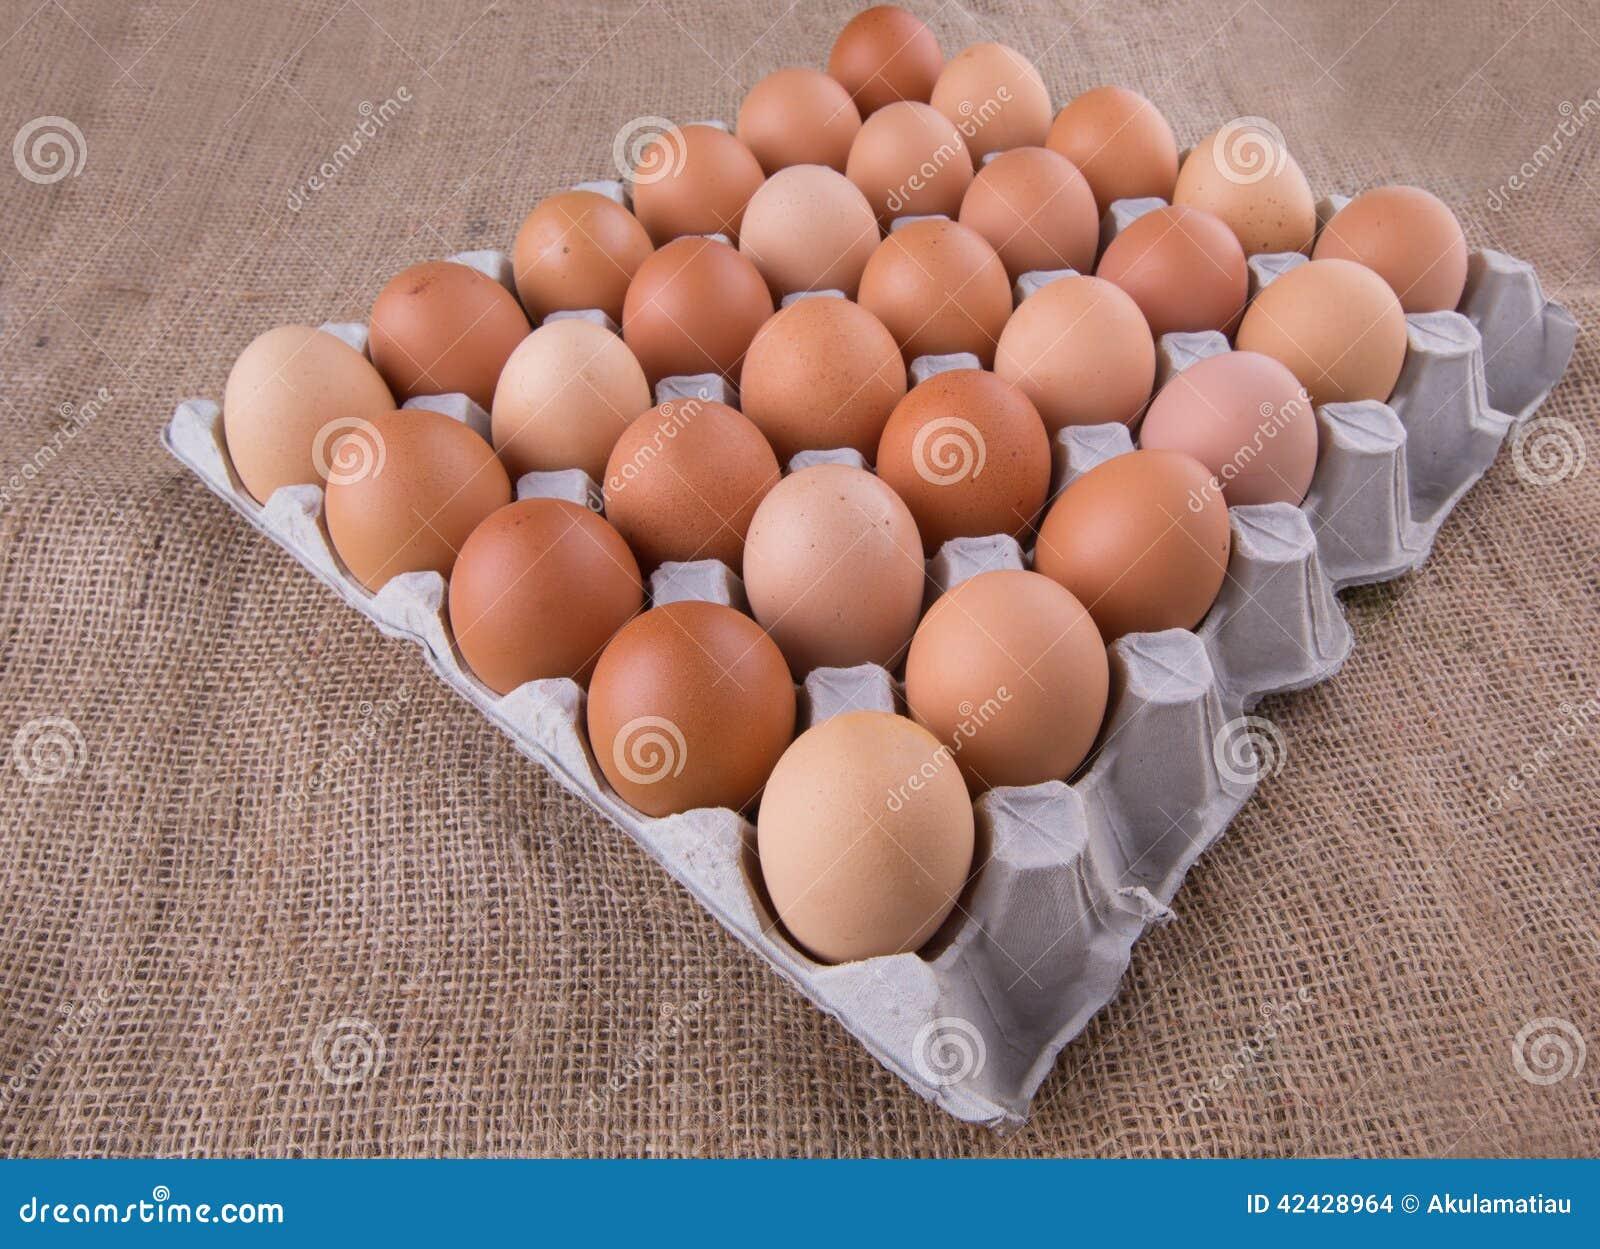 Un cartón del pollo Eggs VI